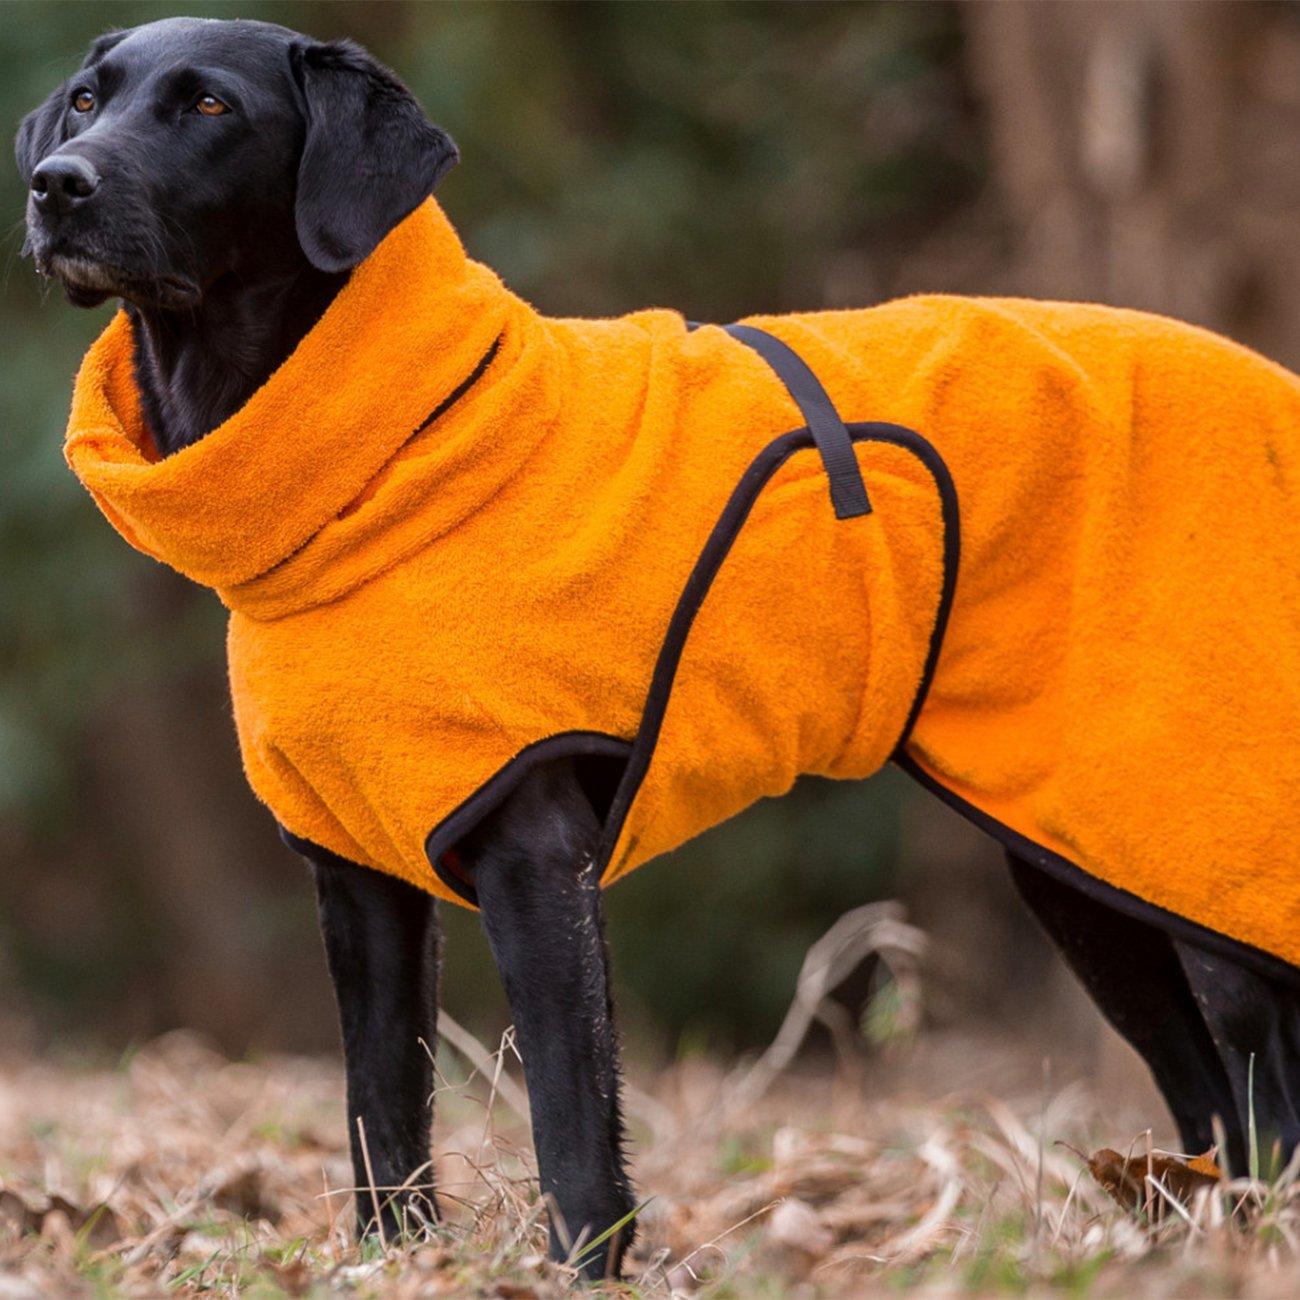 fit4dogs Trockenmantel Hund Dryup Cape, Bild 11